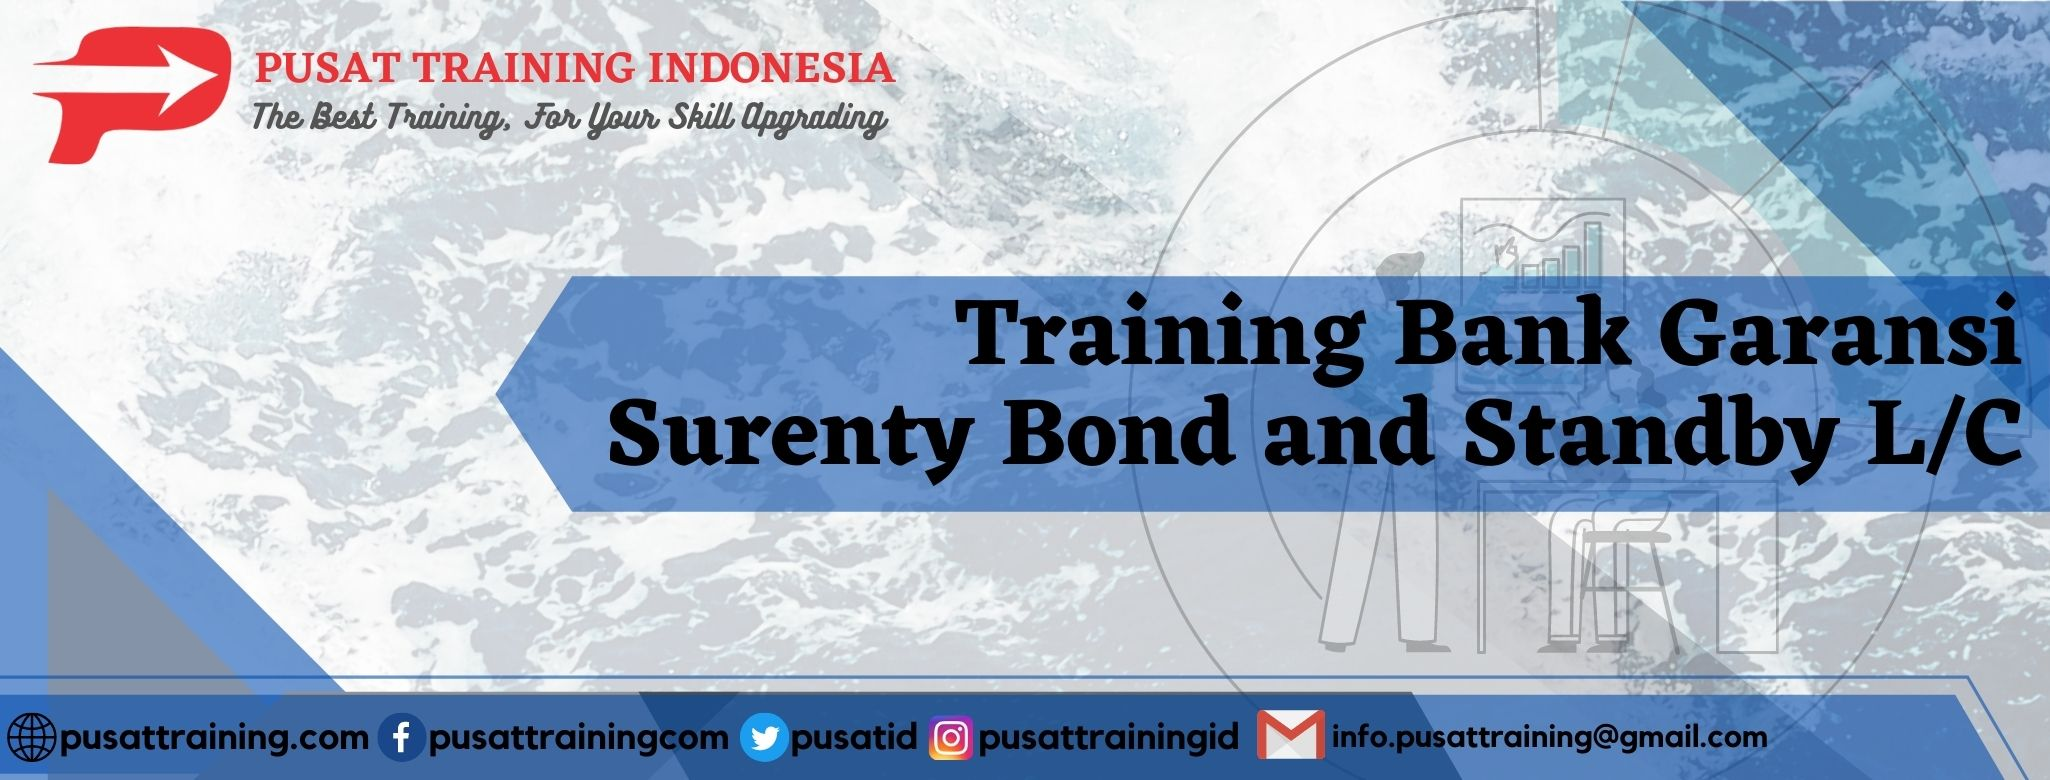 Training-Bank-Garansi-Surenty-Bond-and-Standby-LC